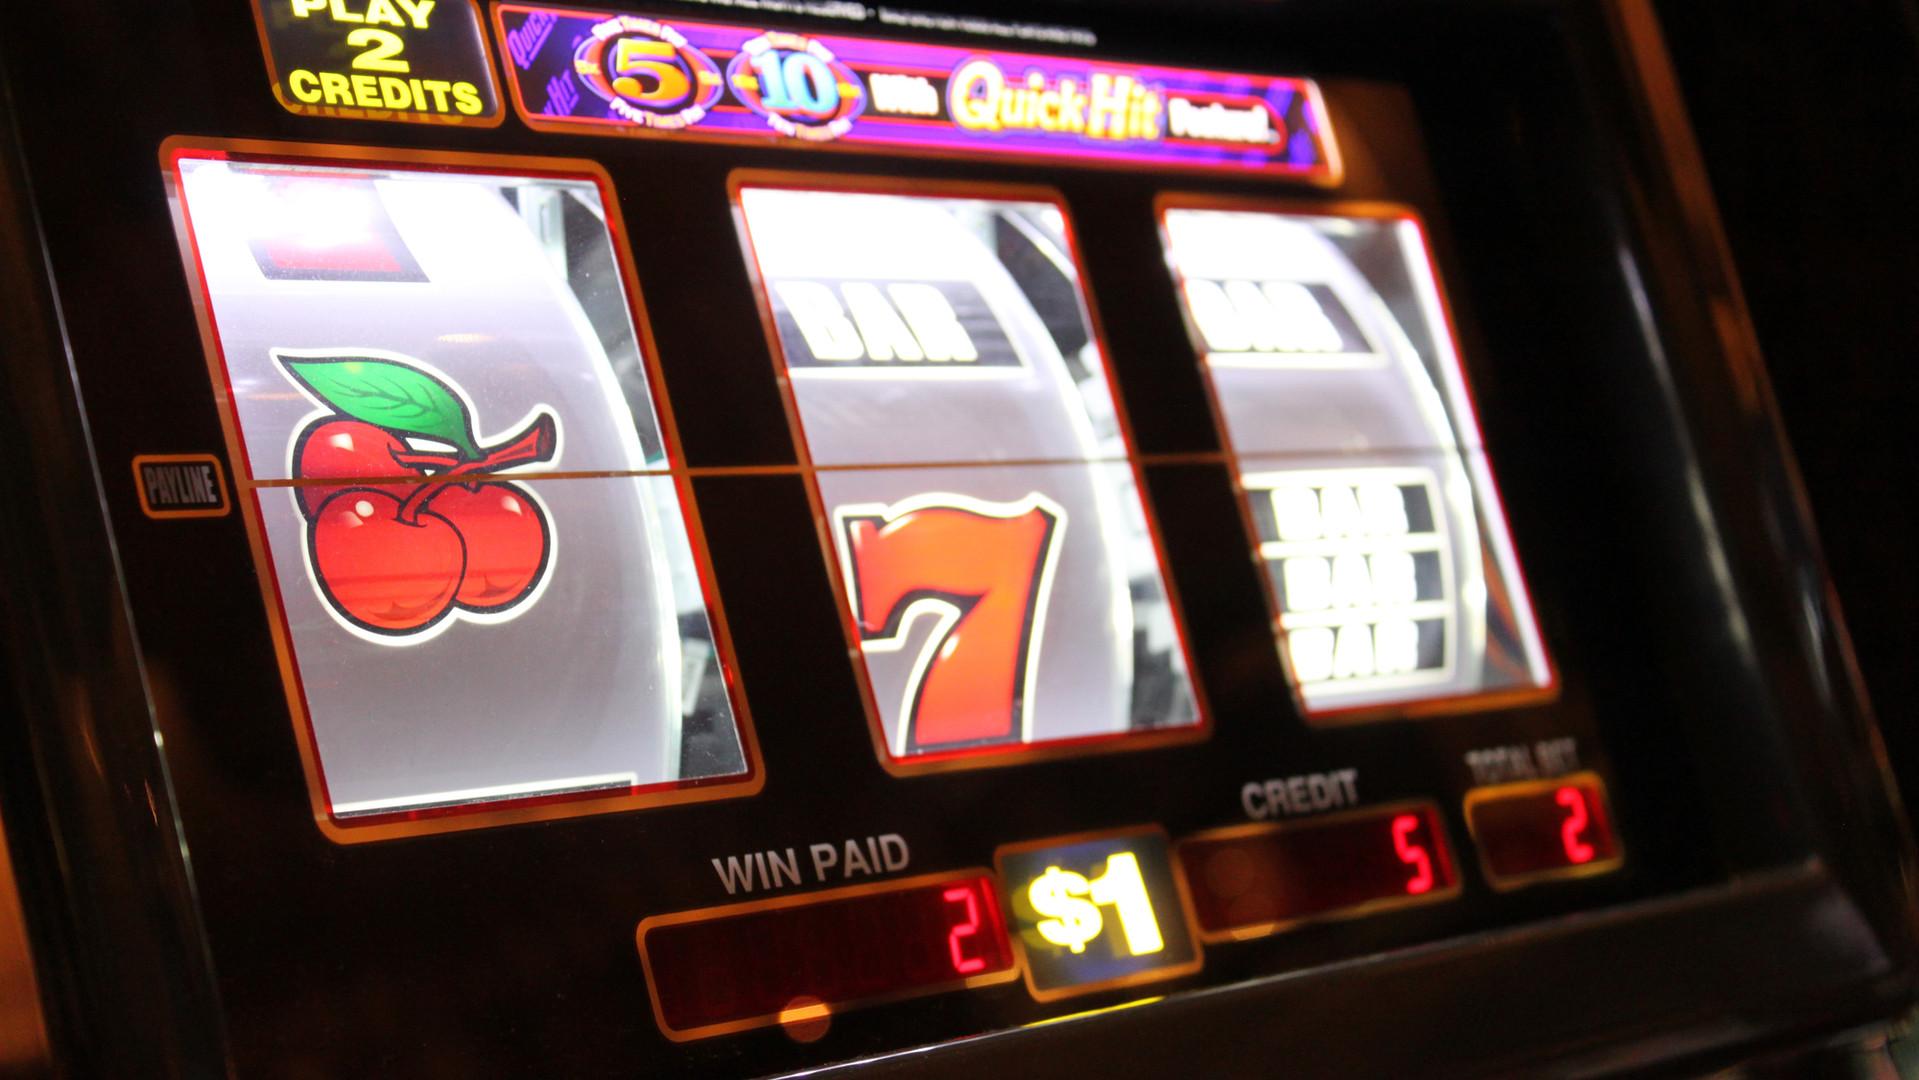 Secretive gambling